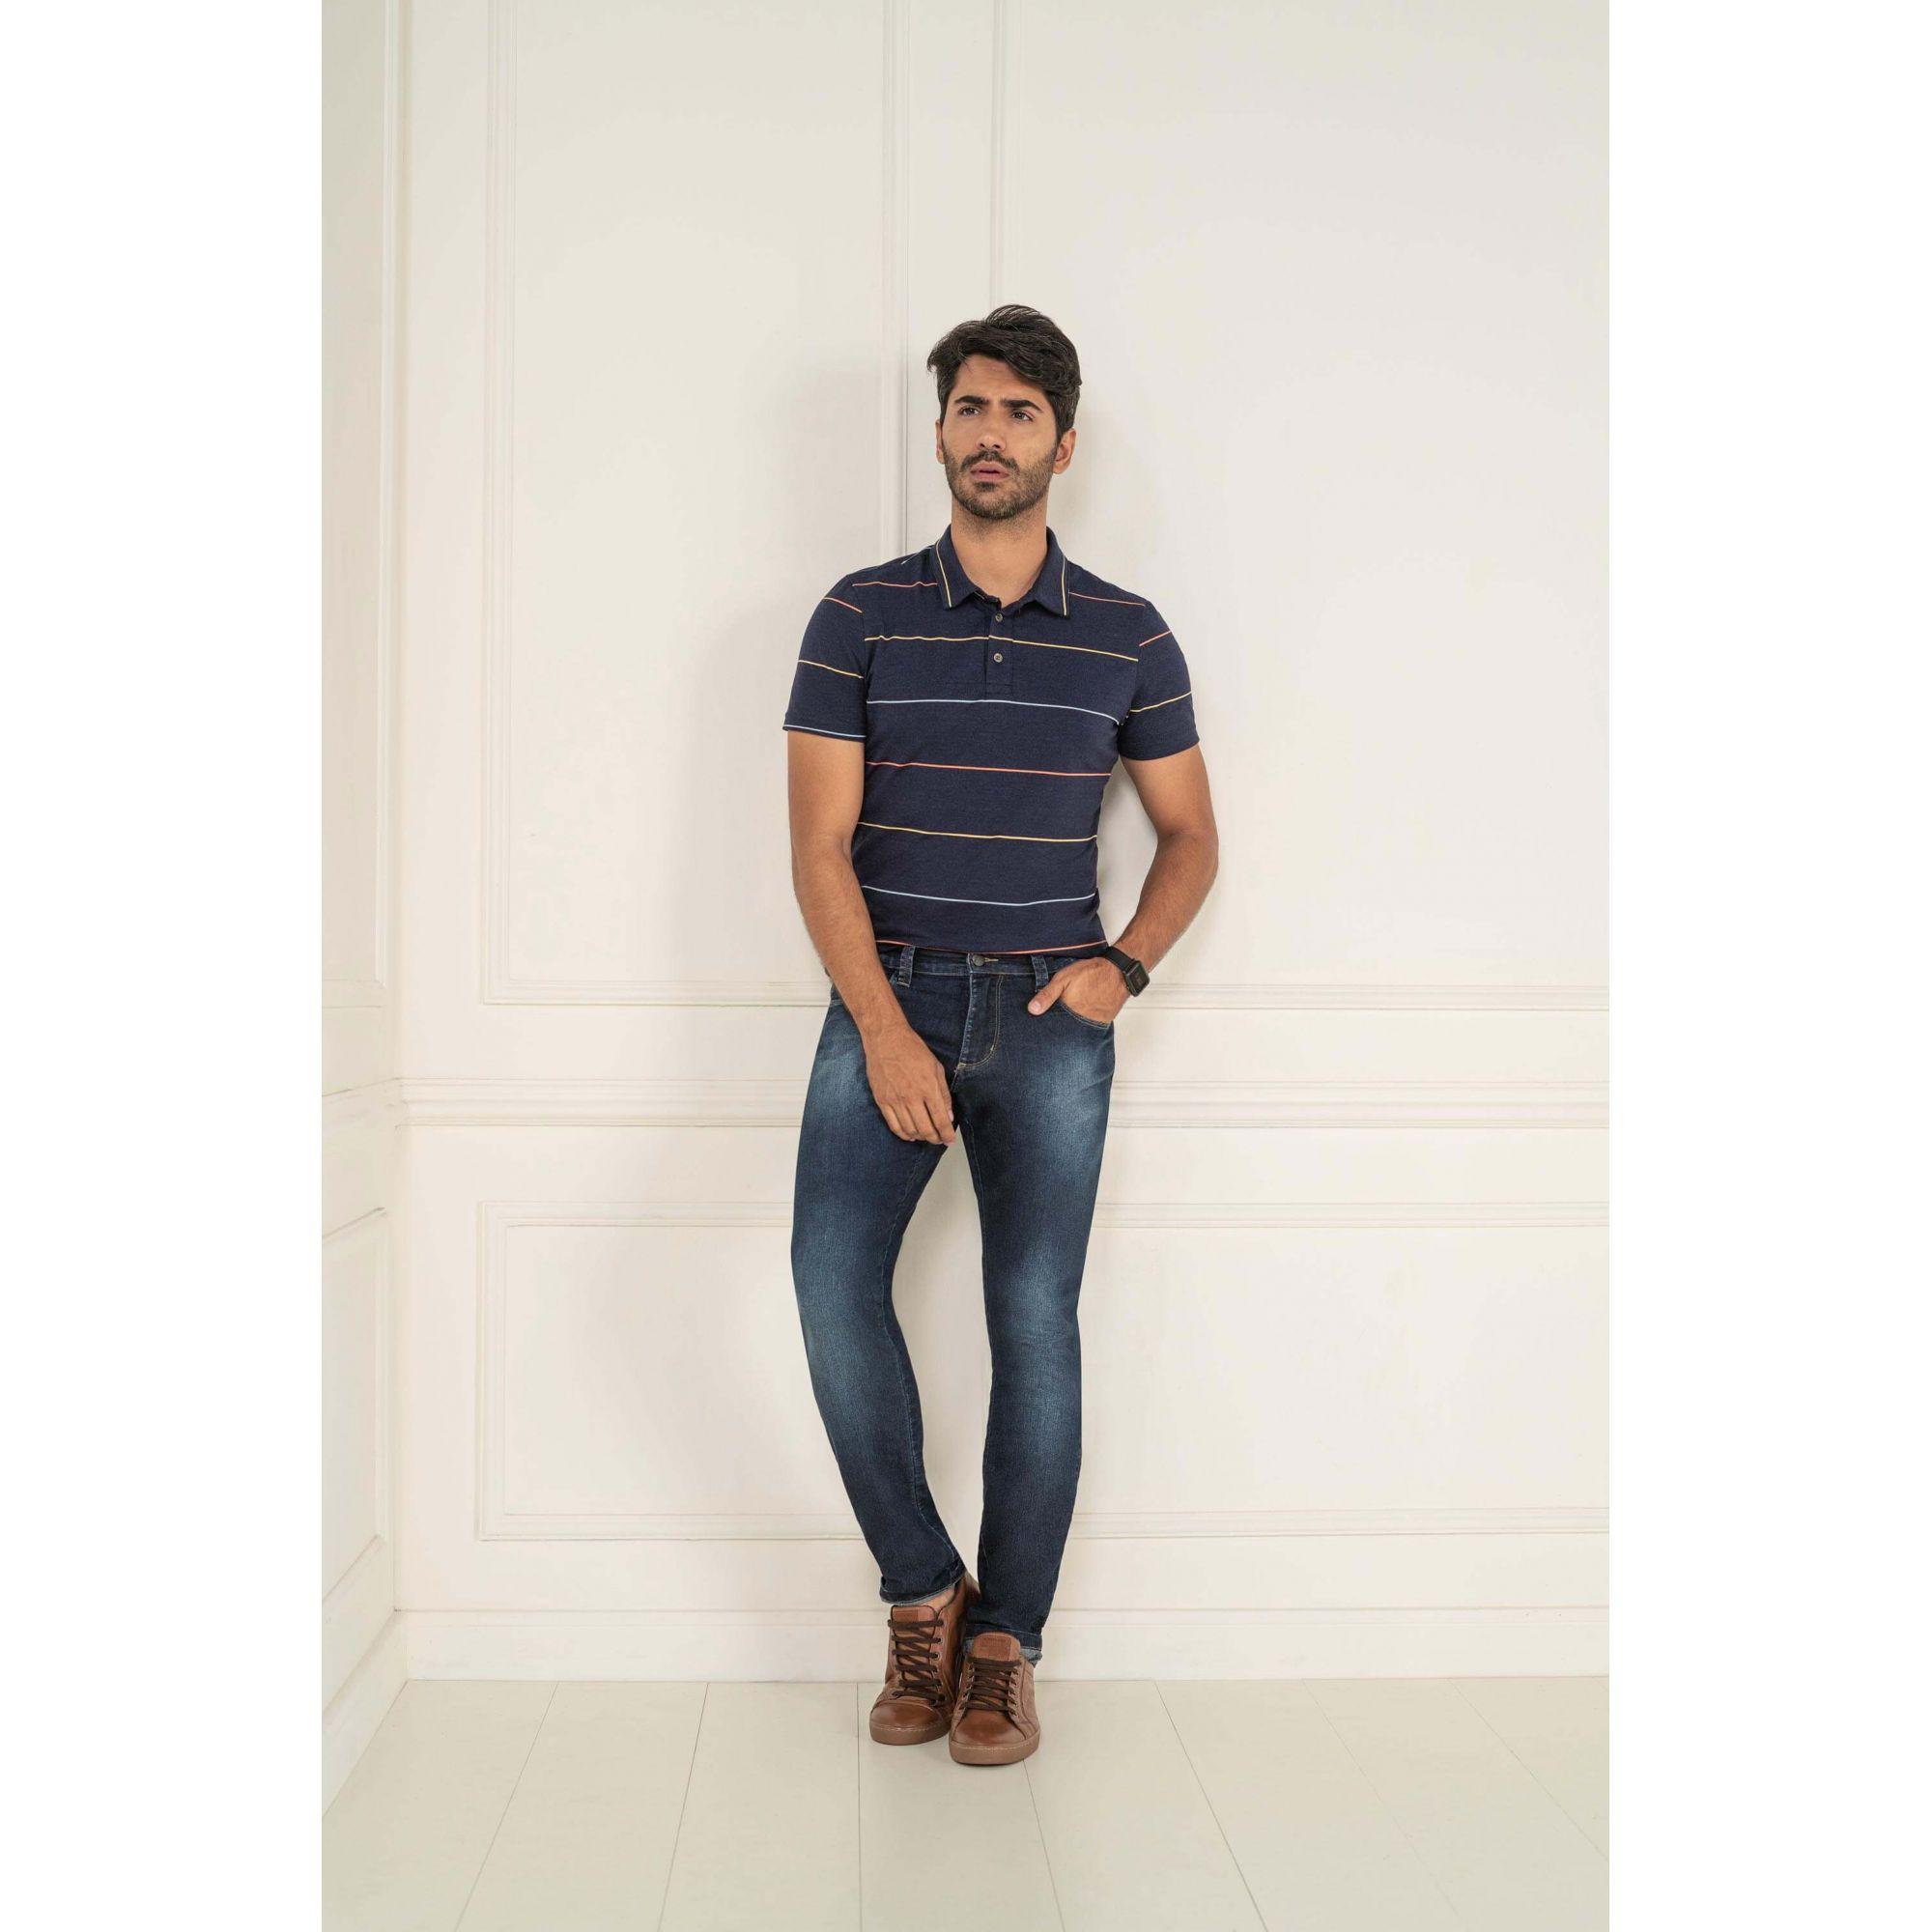 Calça Masculino Slim Lycra Jeans - KACOLAKO